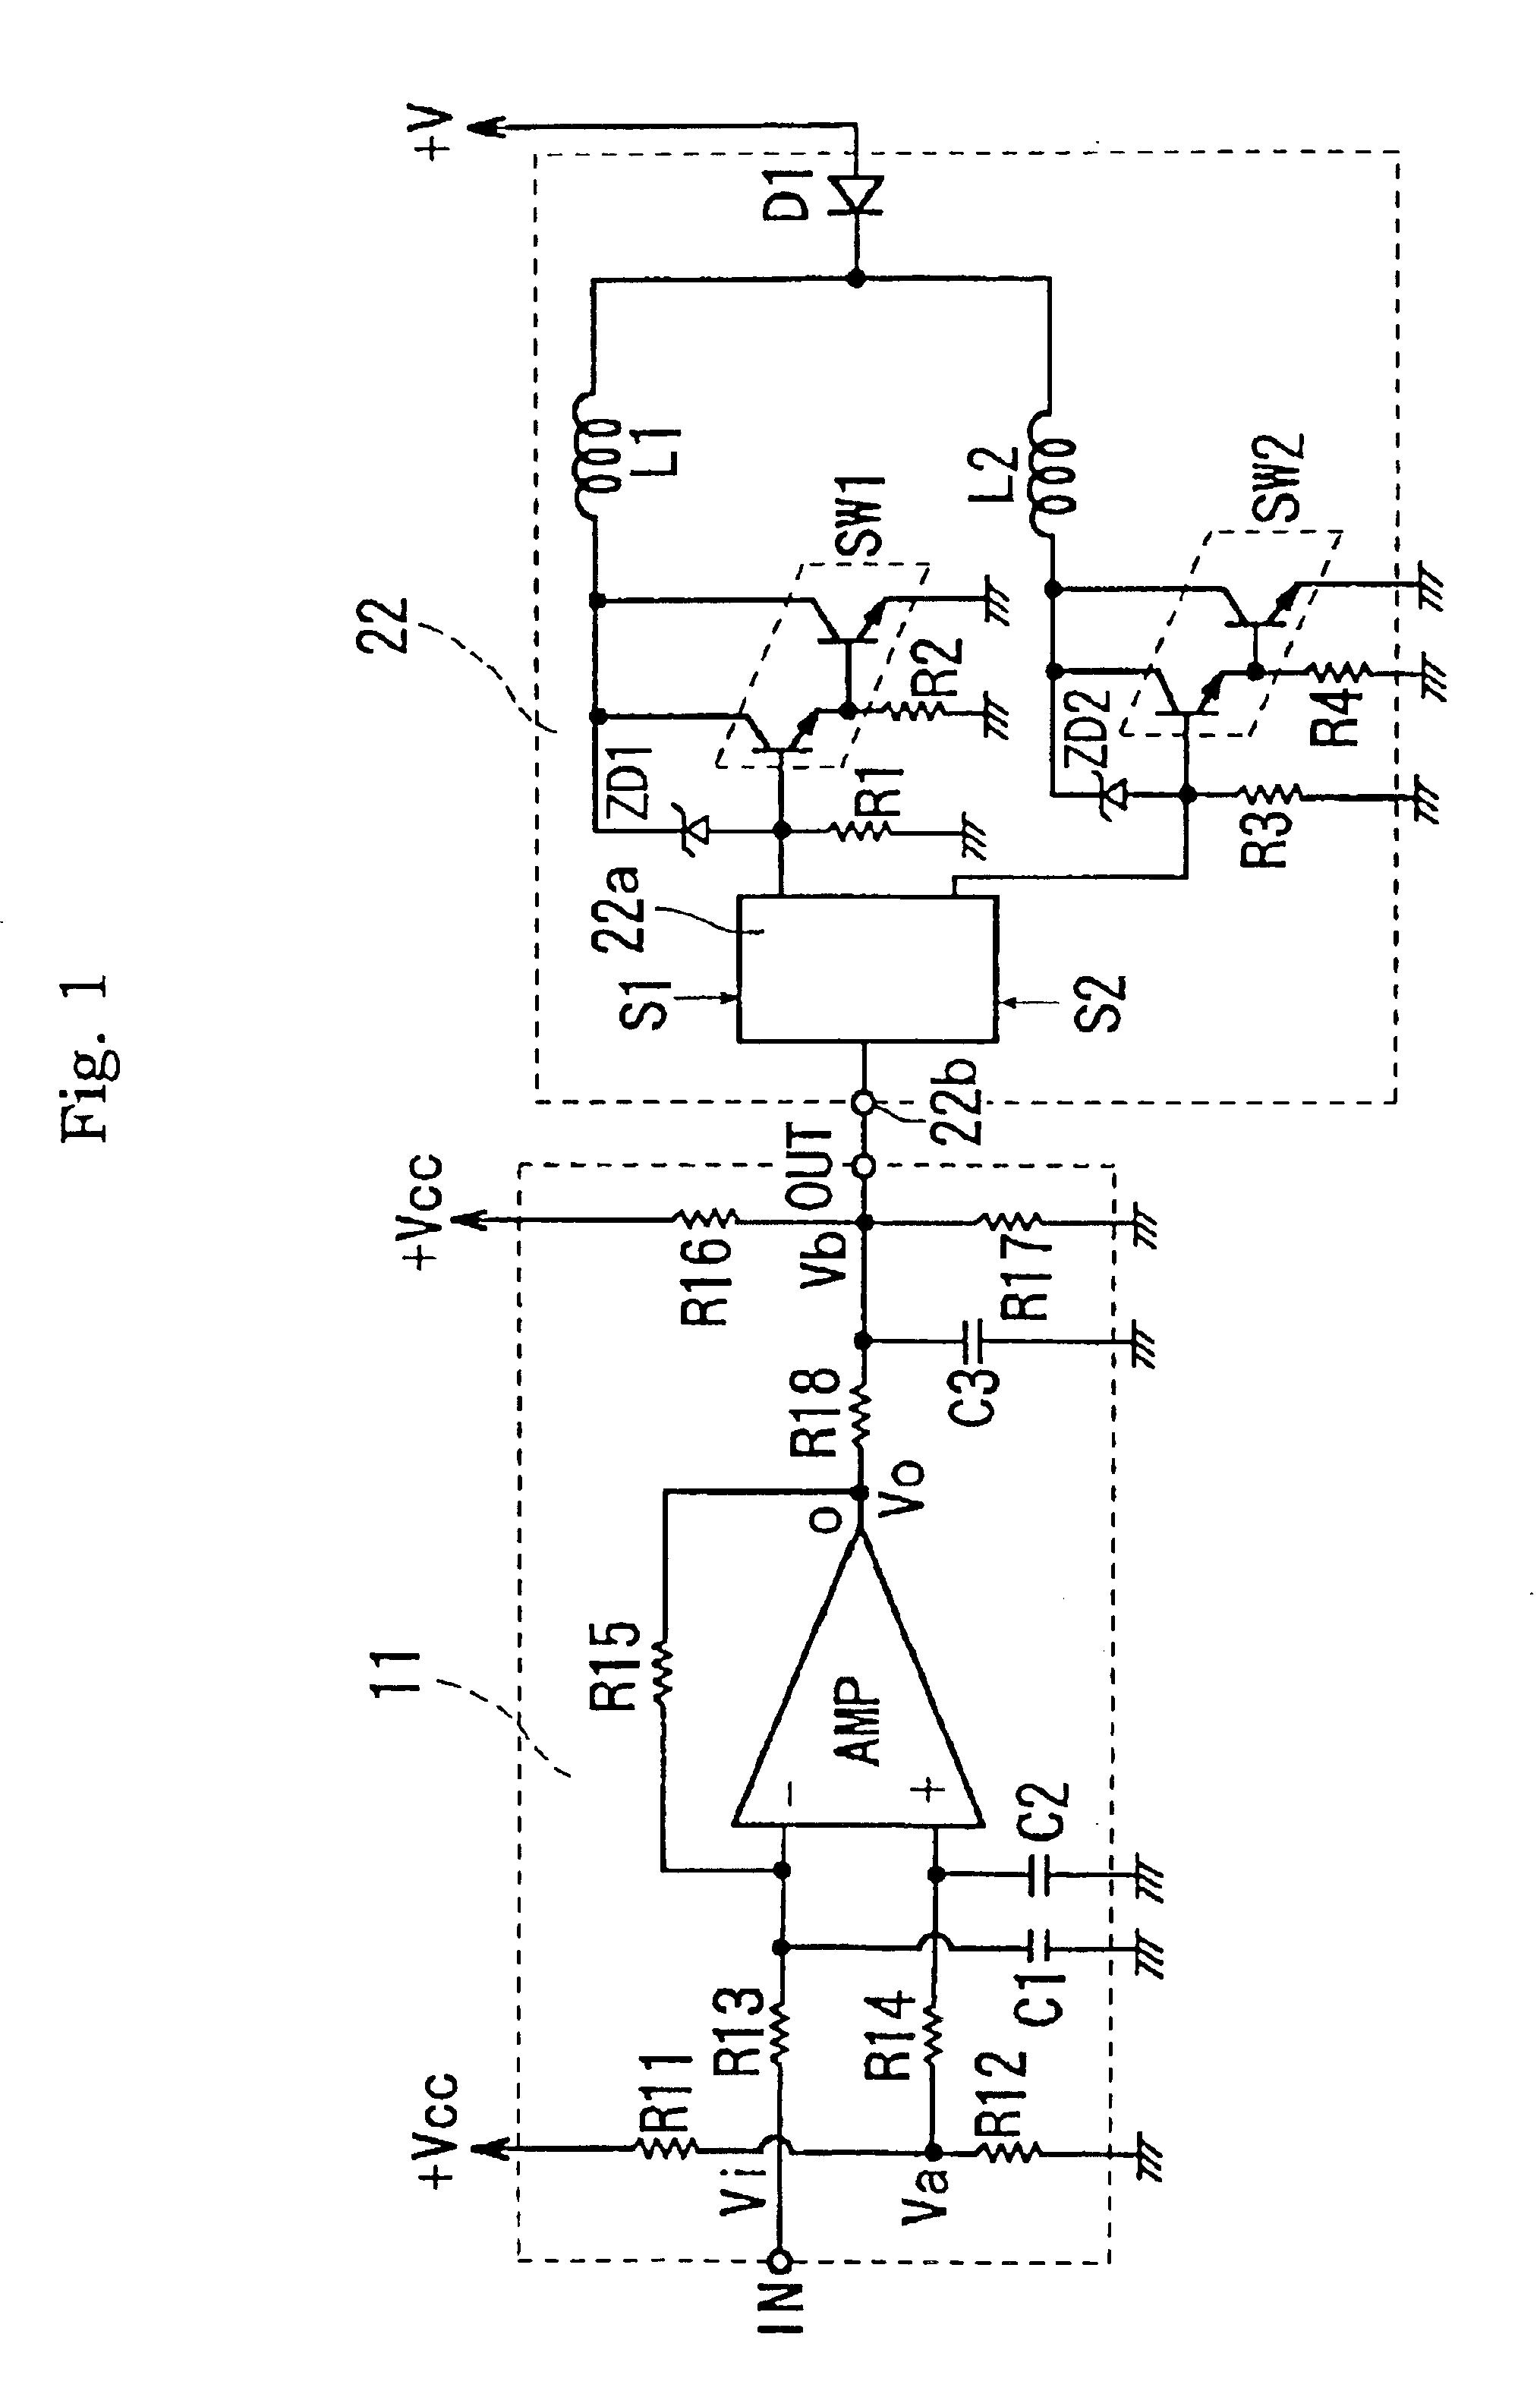 Patent US 6,879,120 B2